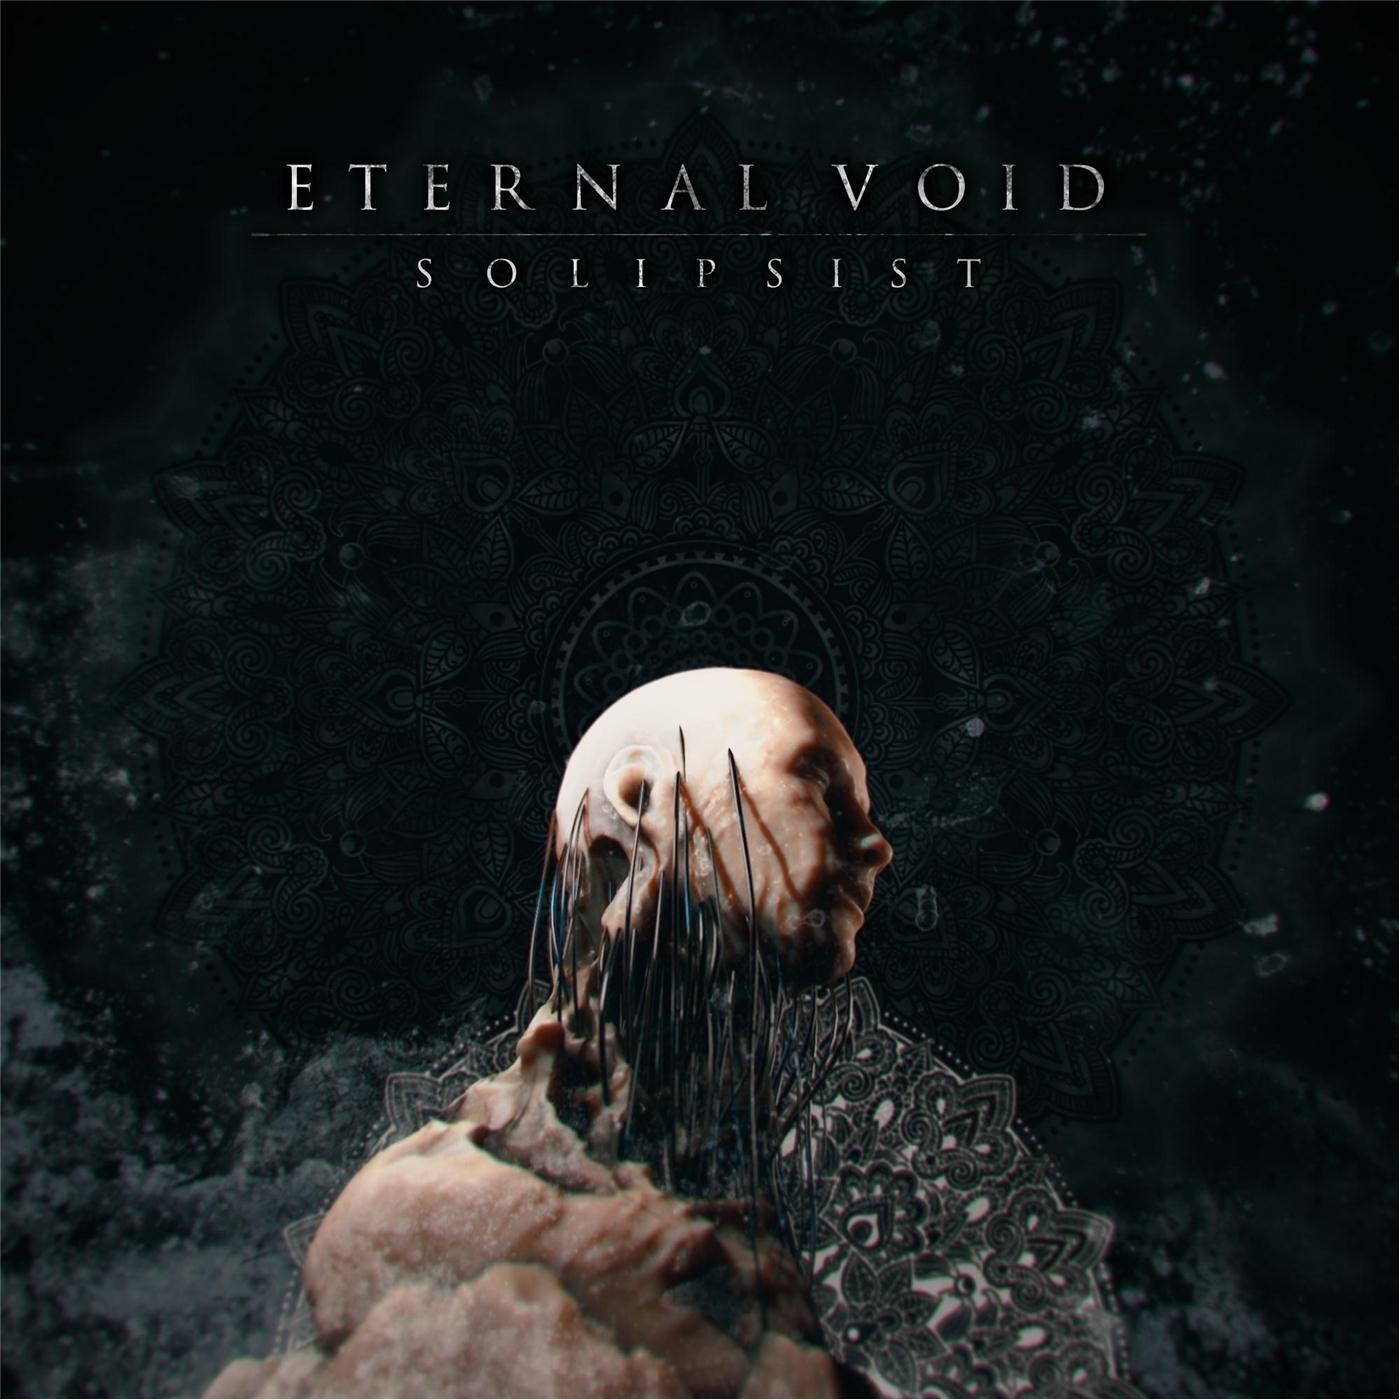 Eternal Void - Solipsist [single] (2017)